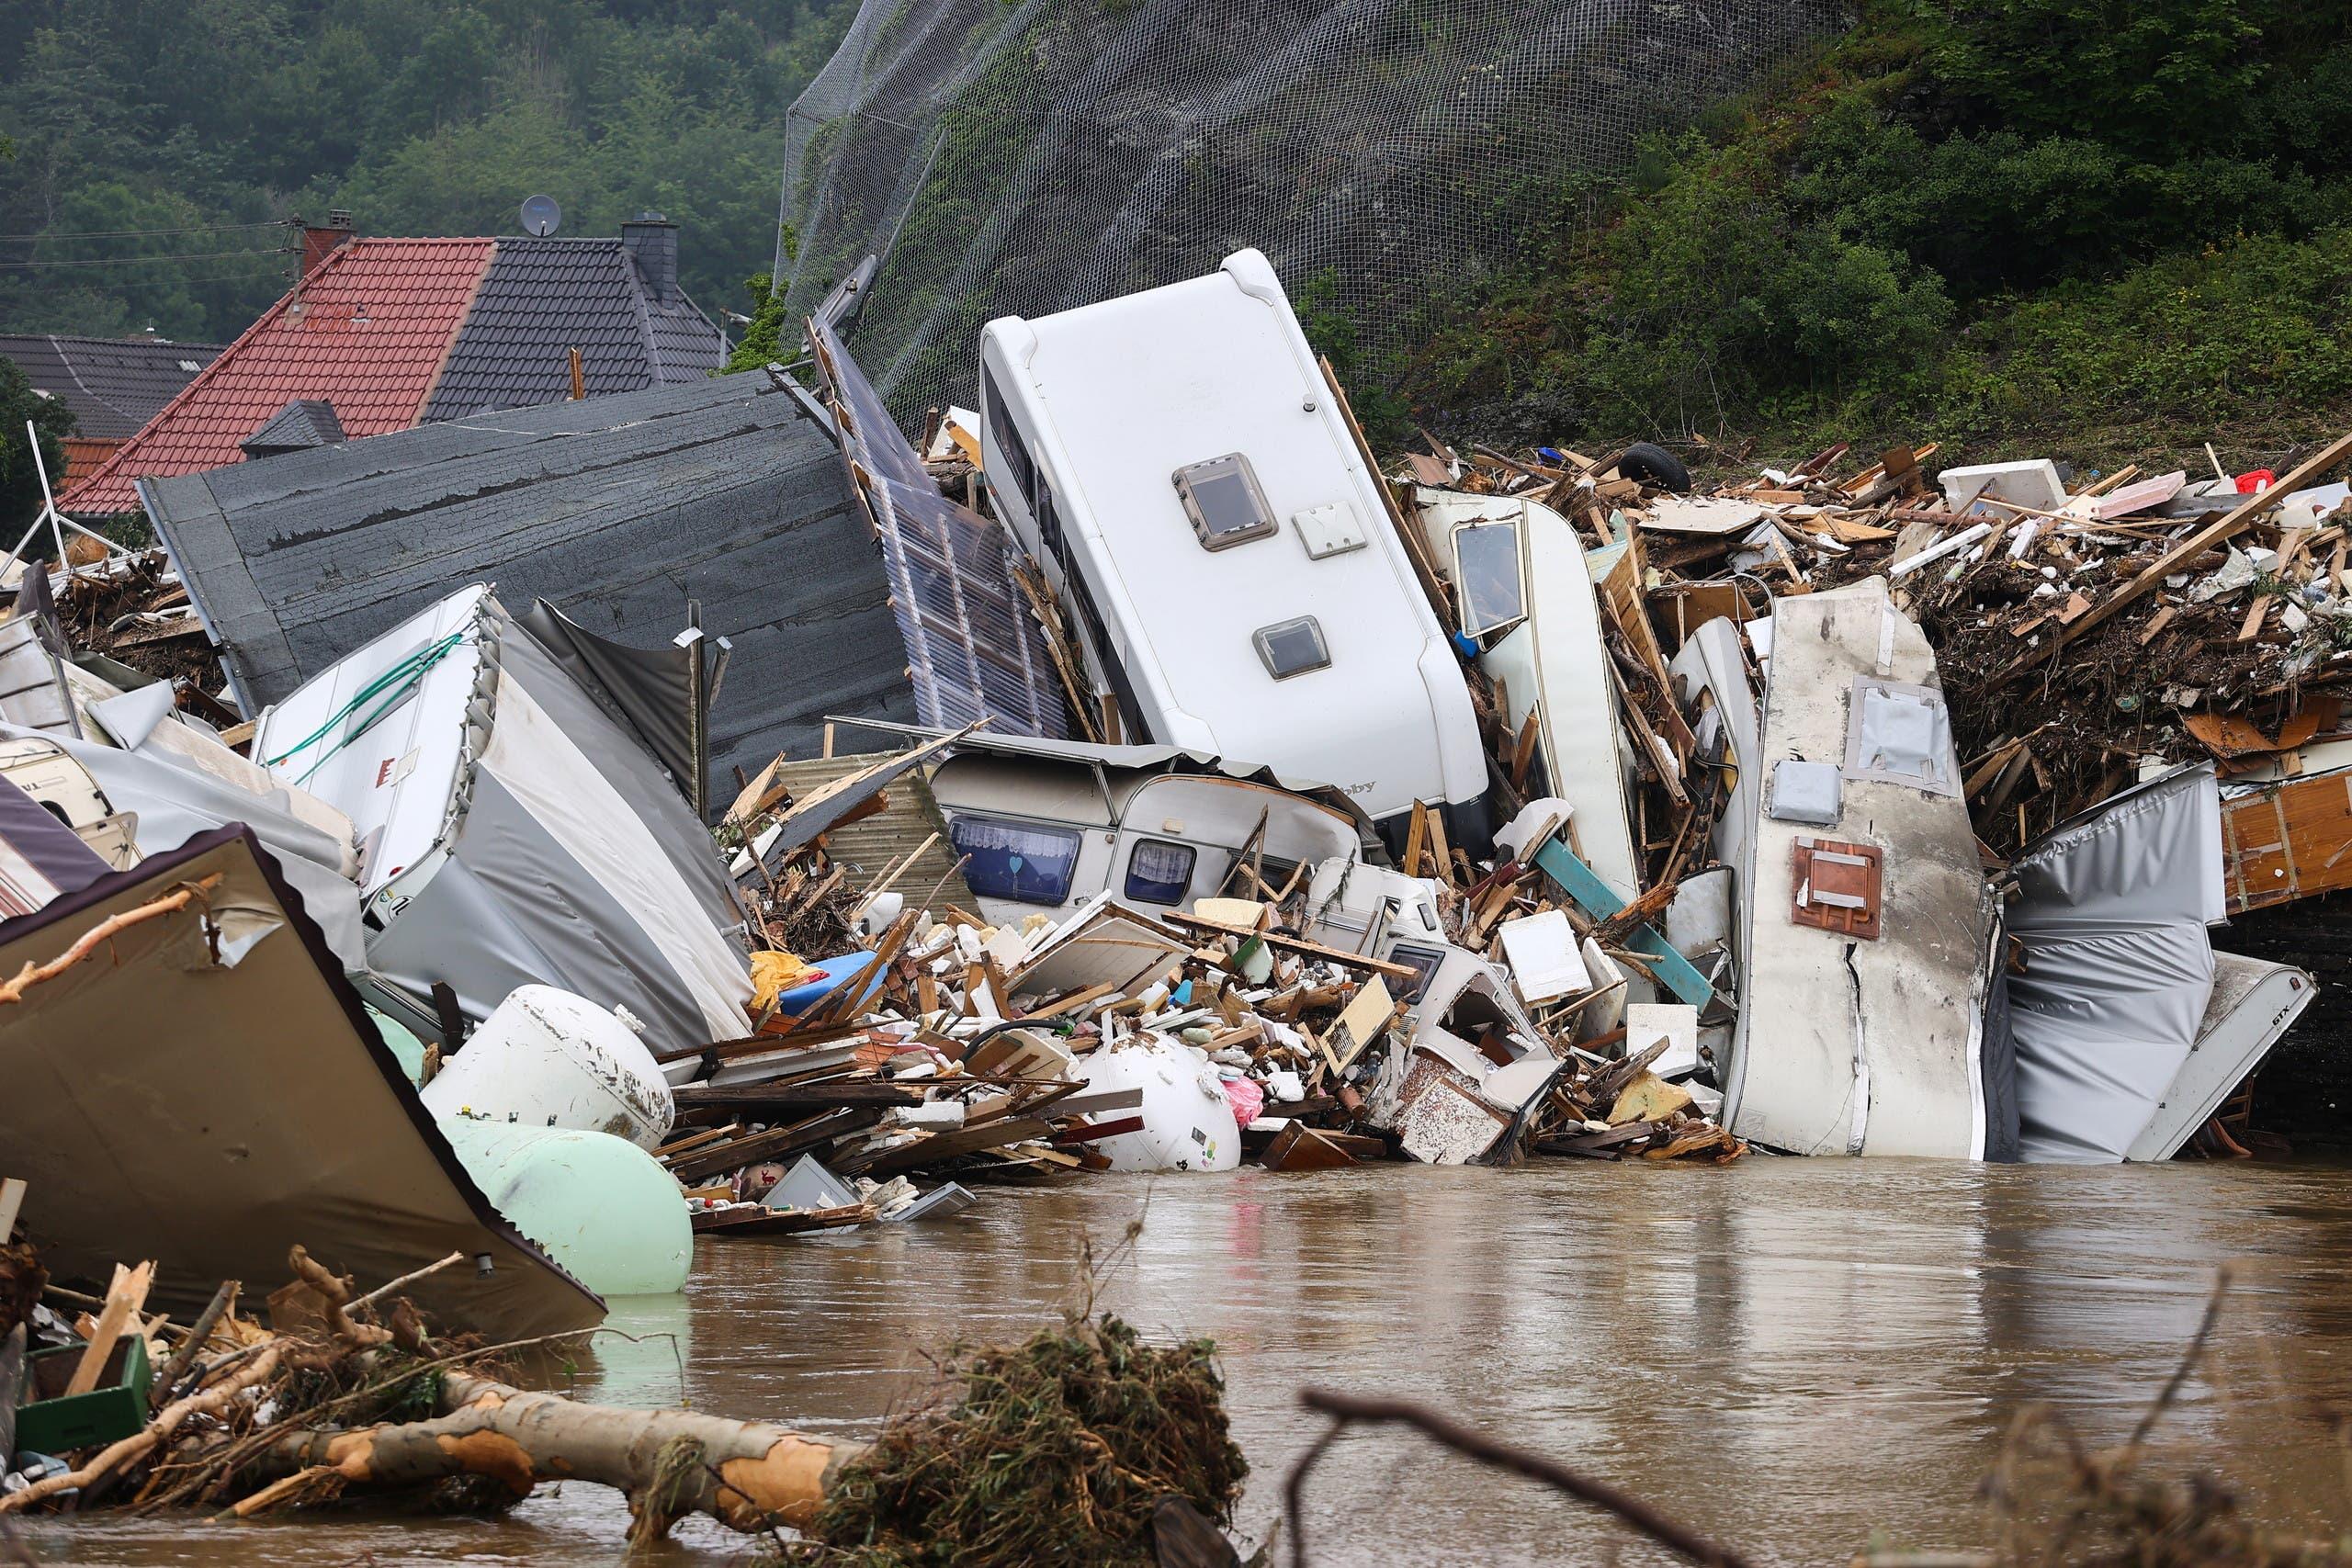 No more survivors found after German floods